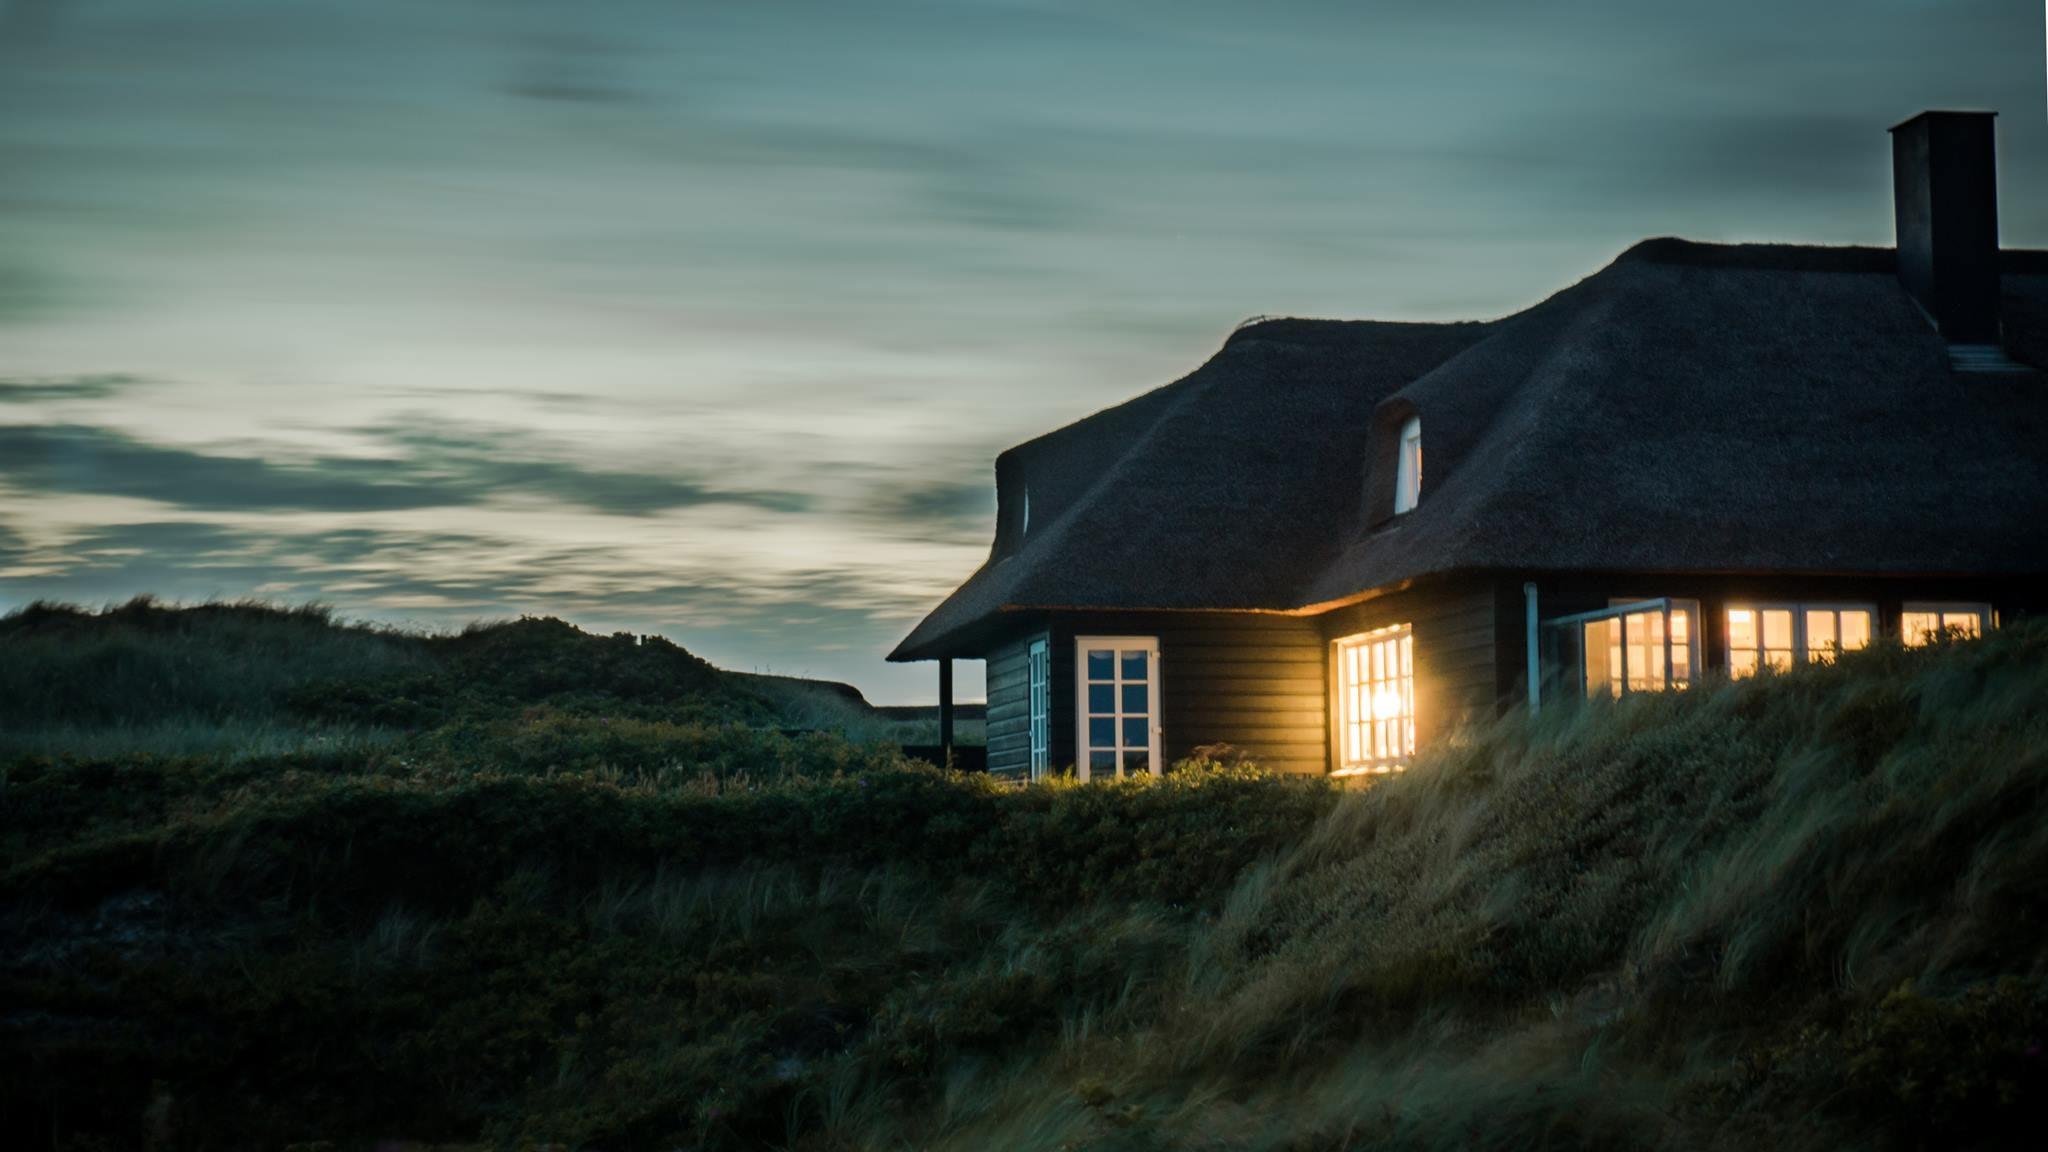 architecture-bungalow-chimney-731082